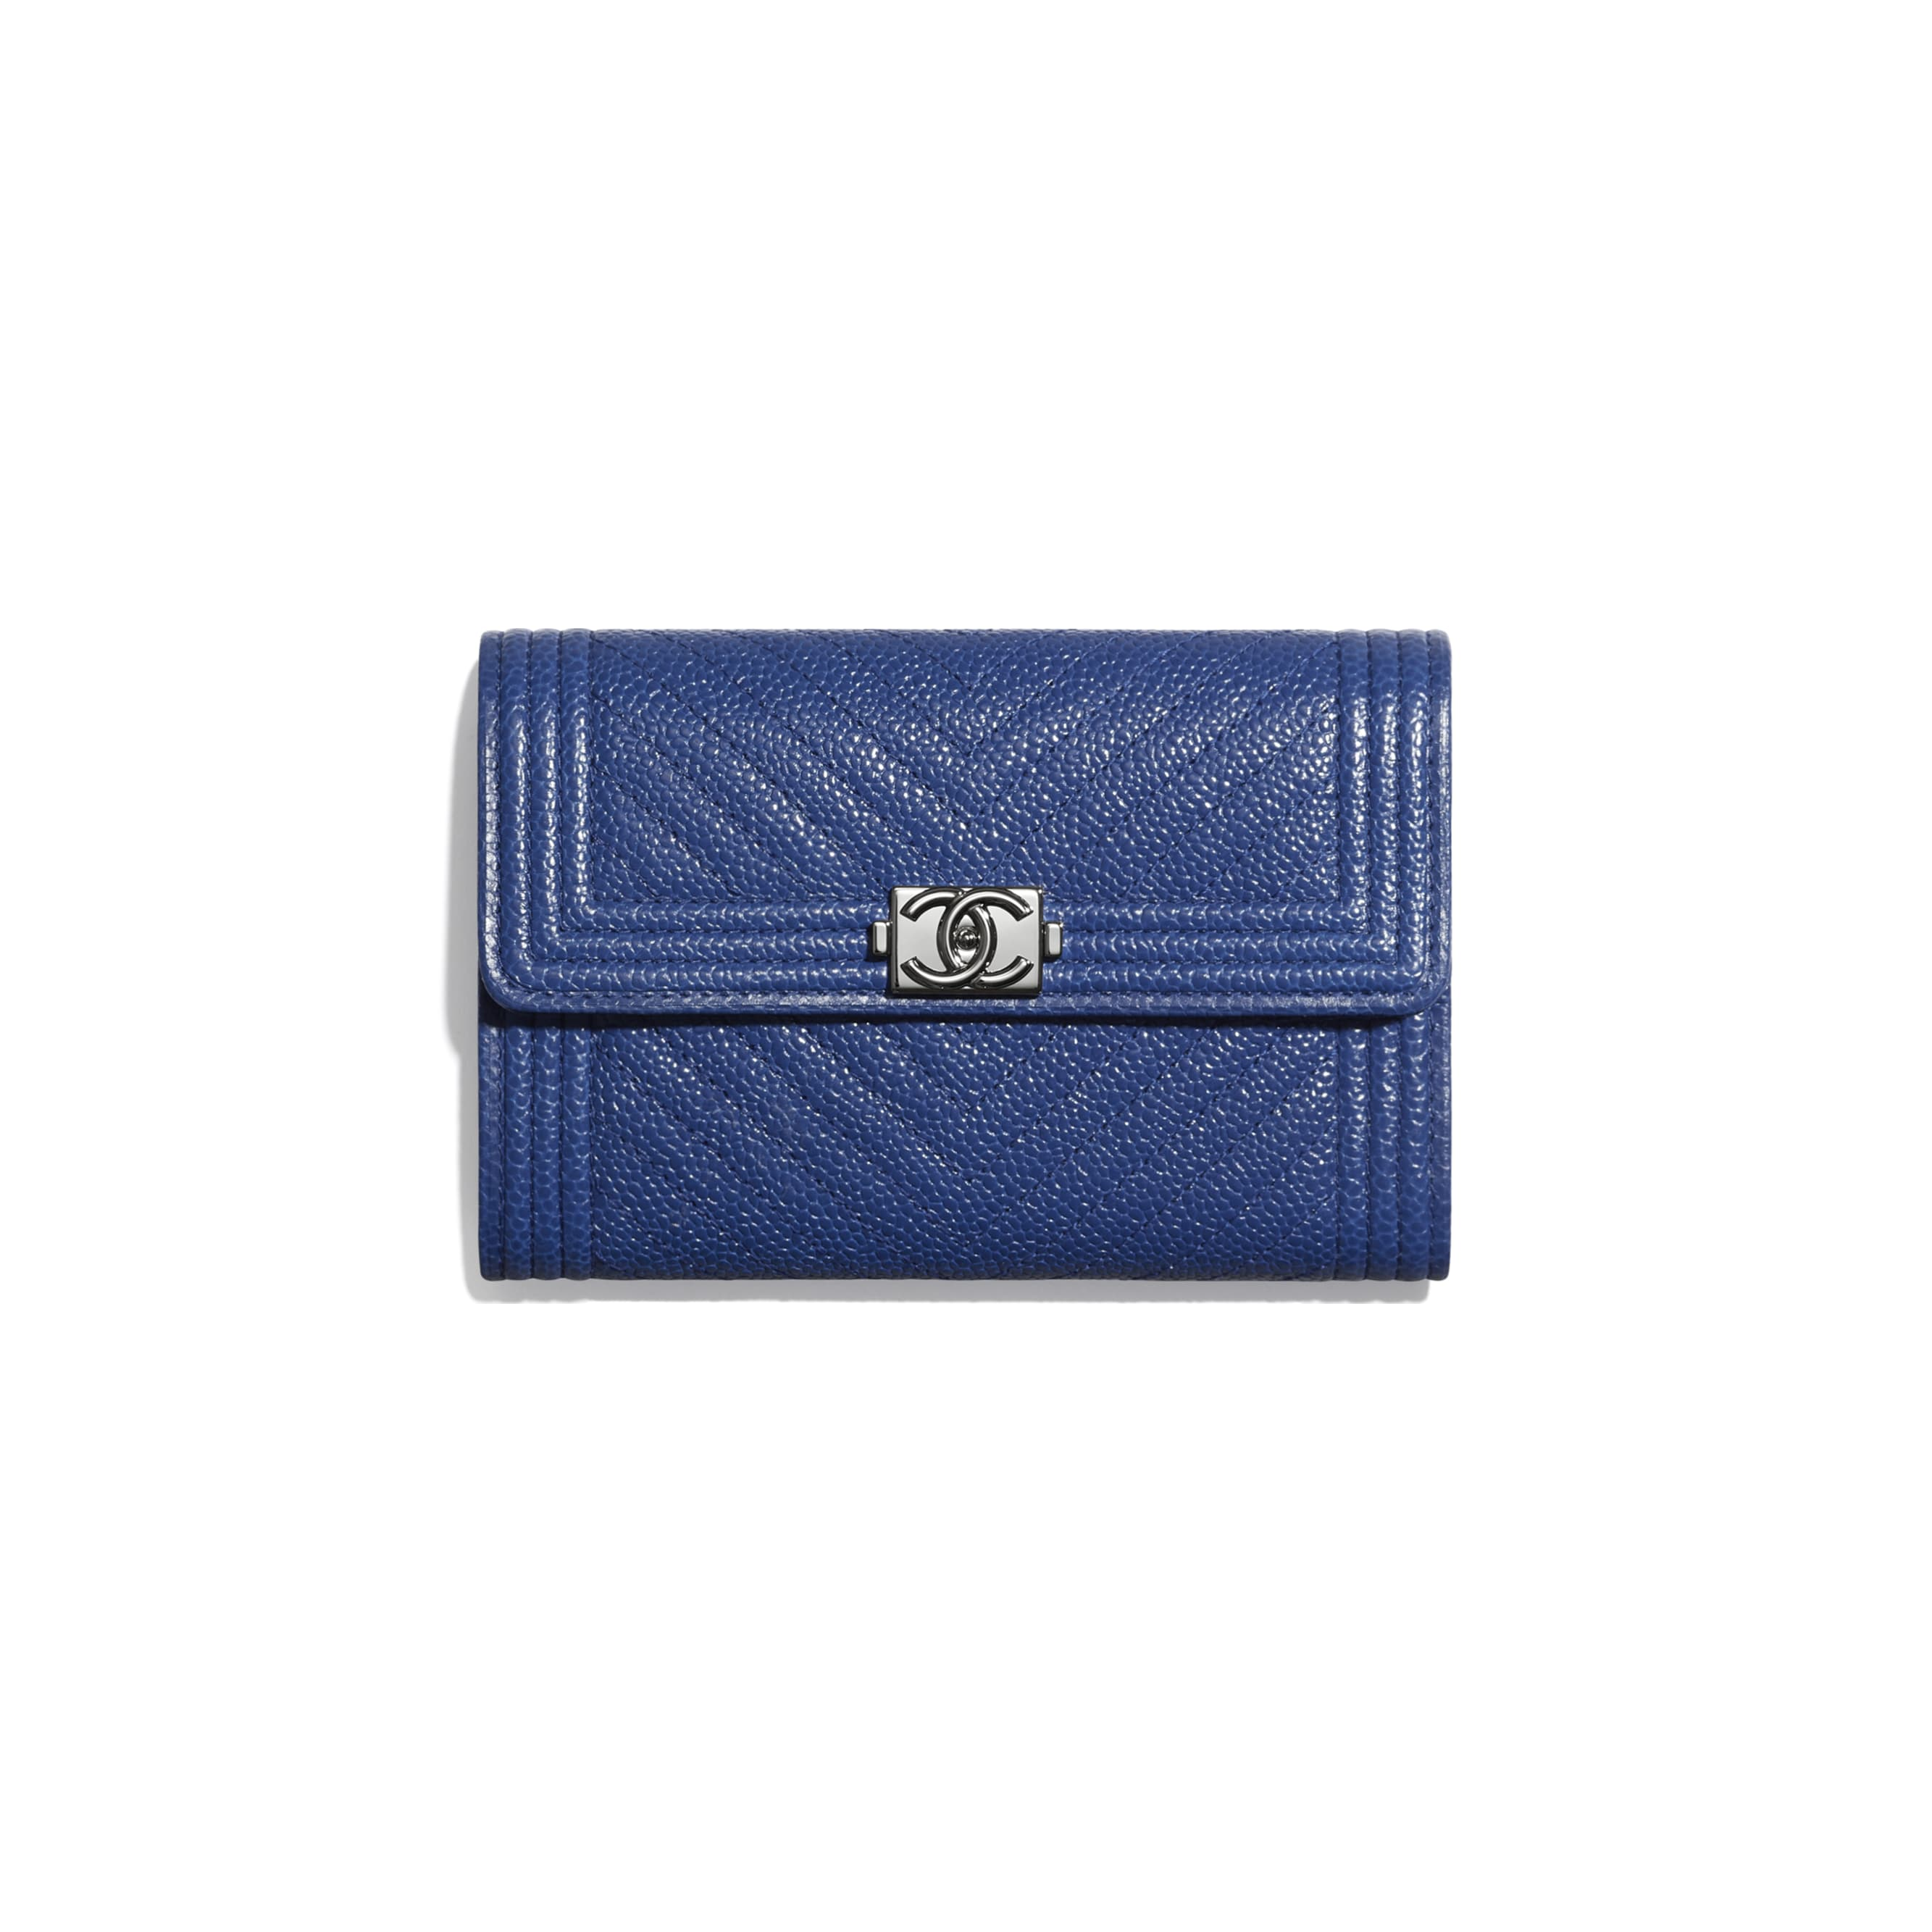 BOY CHANEL Flap Wallet - Dark Blue - Shiny Grained Calfskin & Silver-Tone Metal - CHANEL - Default view - see standard sized version